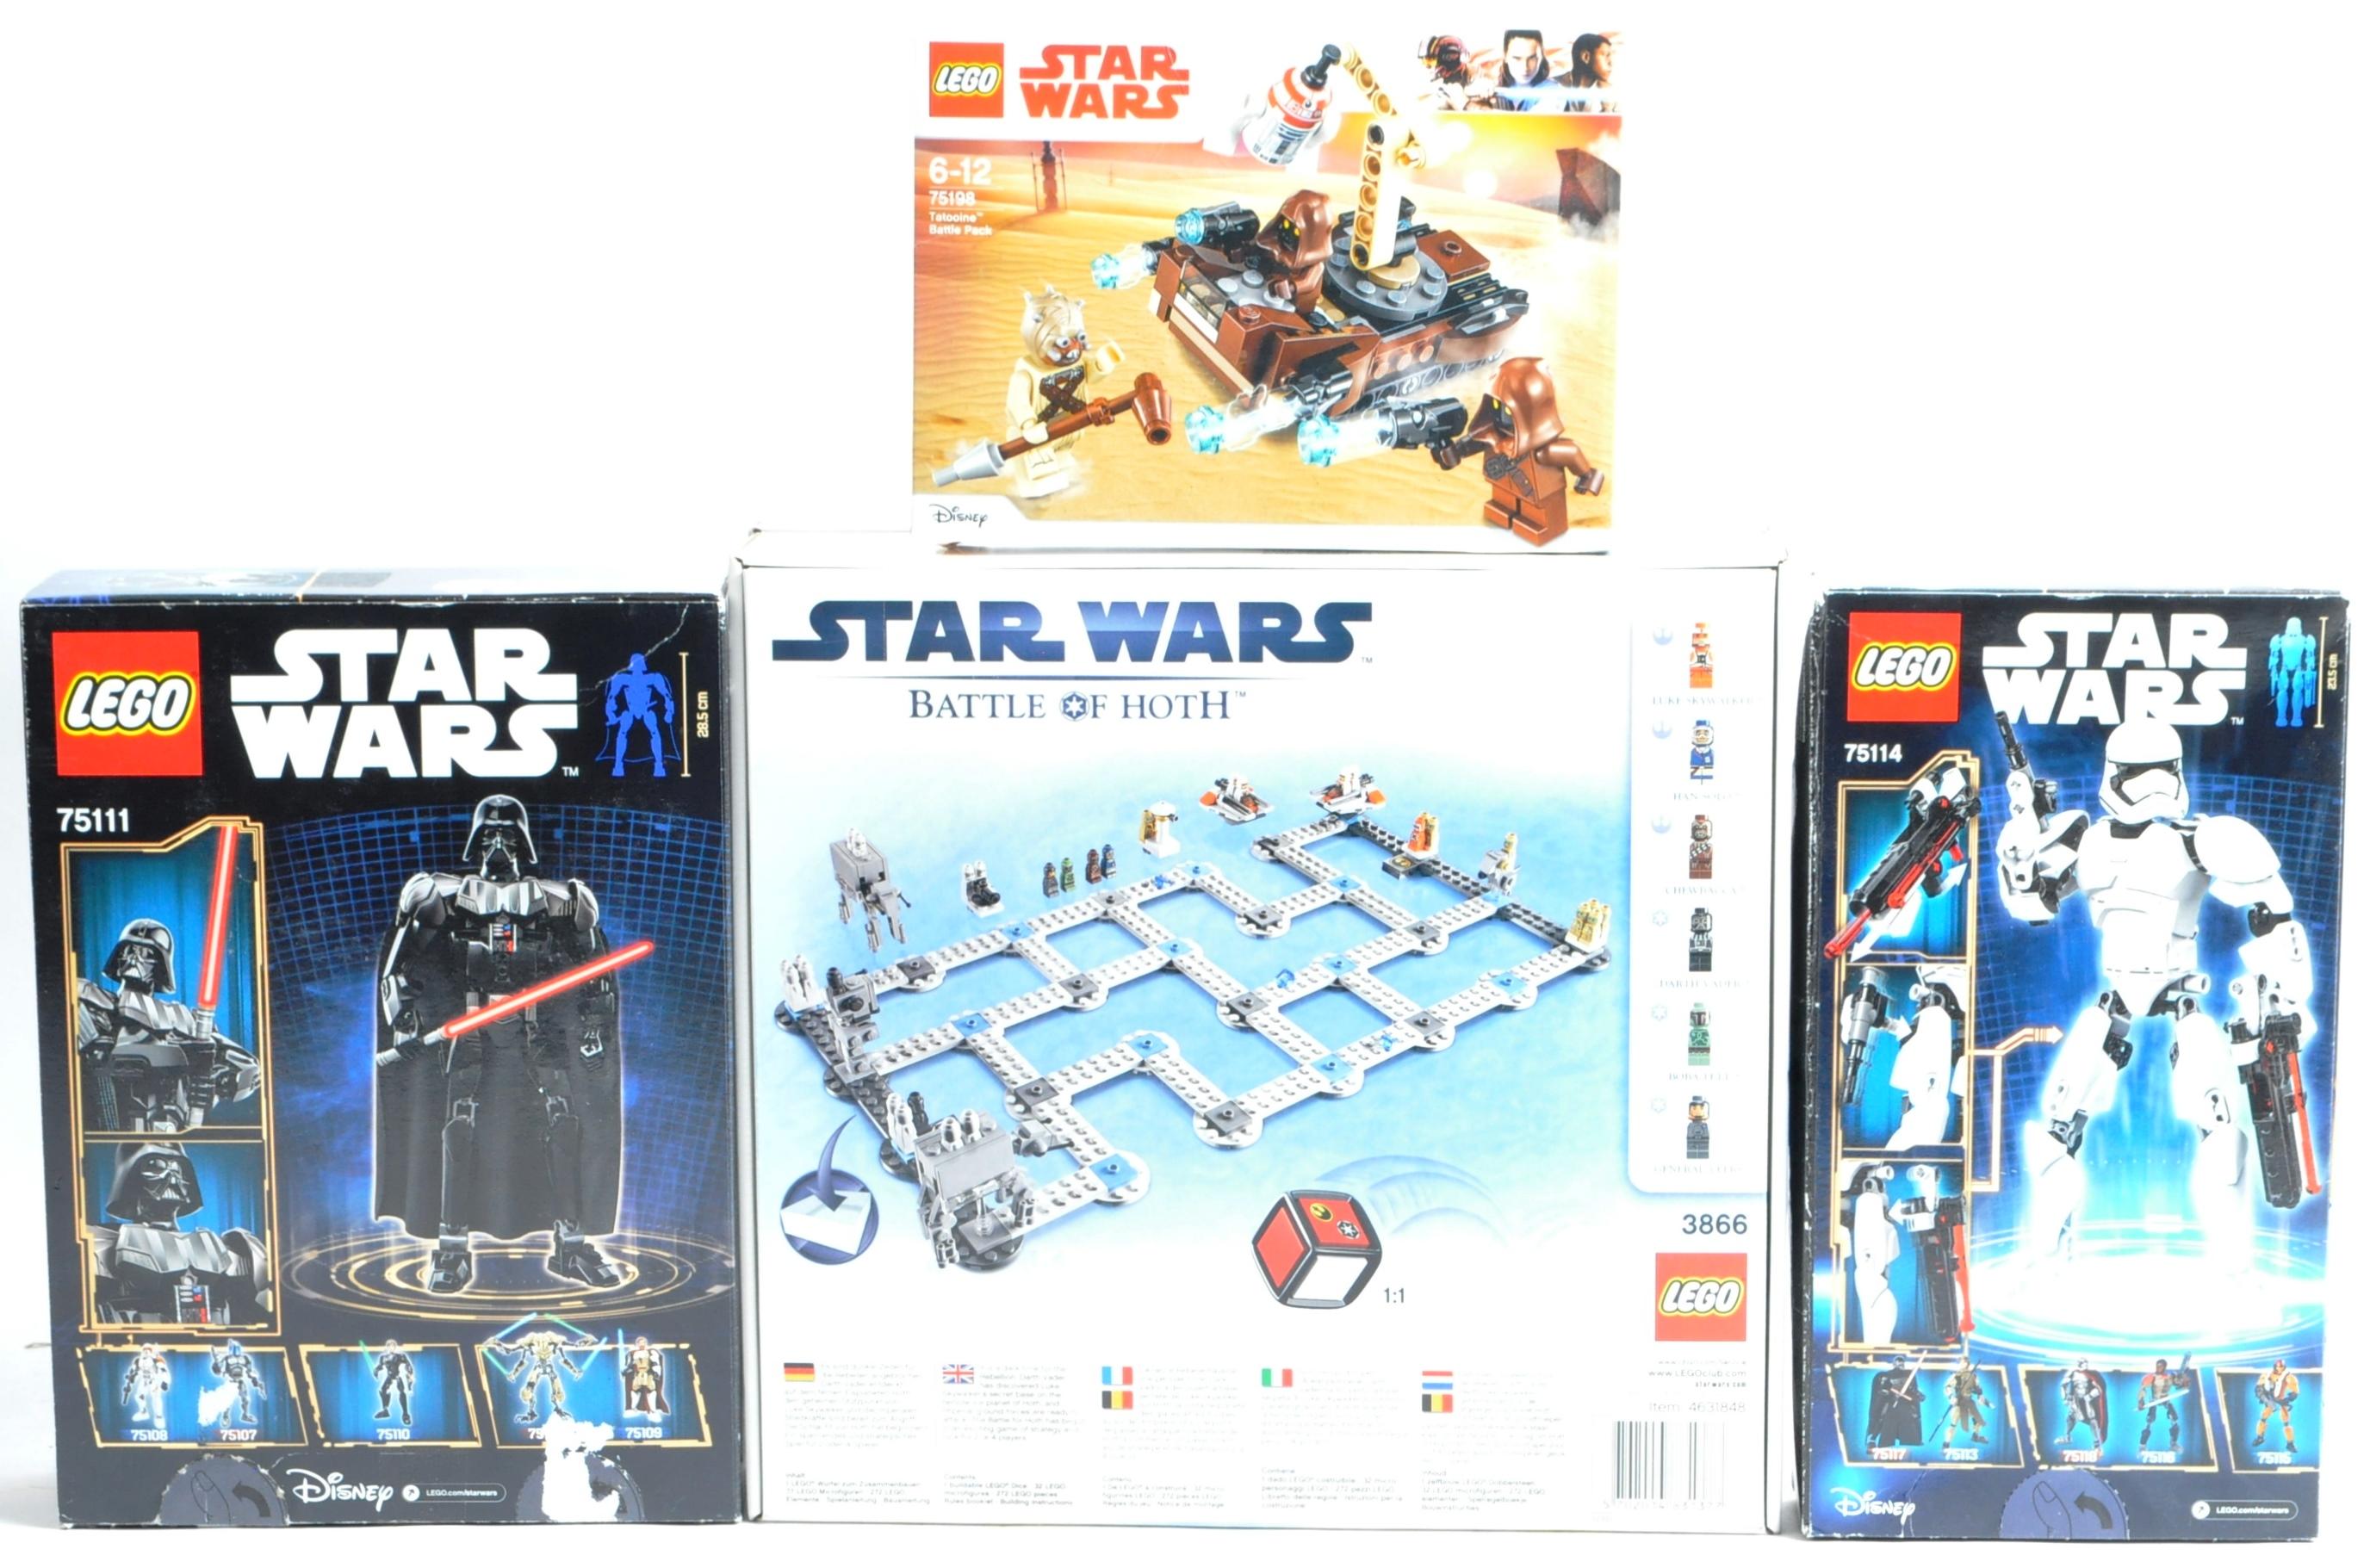 LEGO SETS - LEGO STAR WARS - 3866 / 75111 / 75114 / 75198 - Image 6 of 8